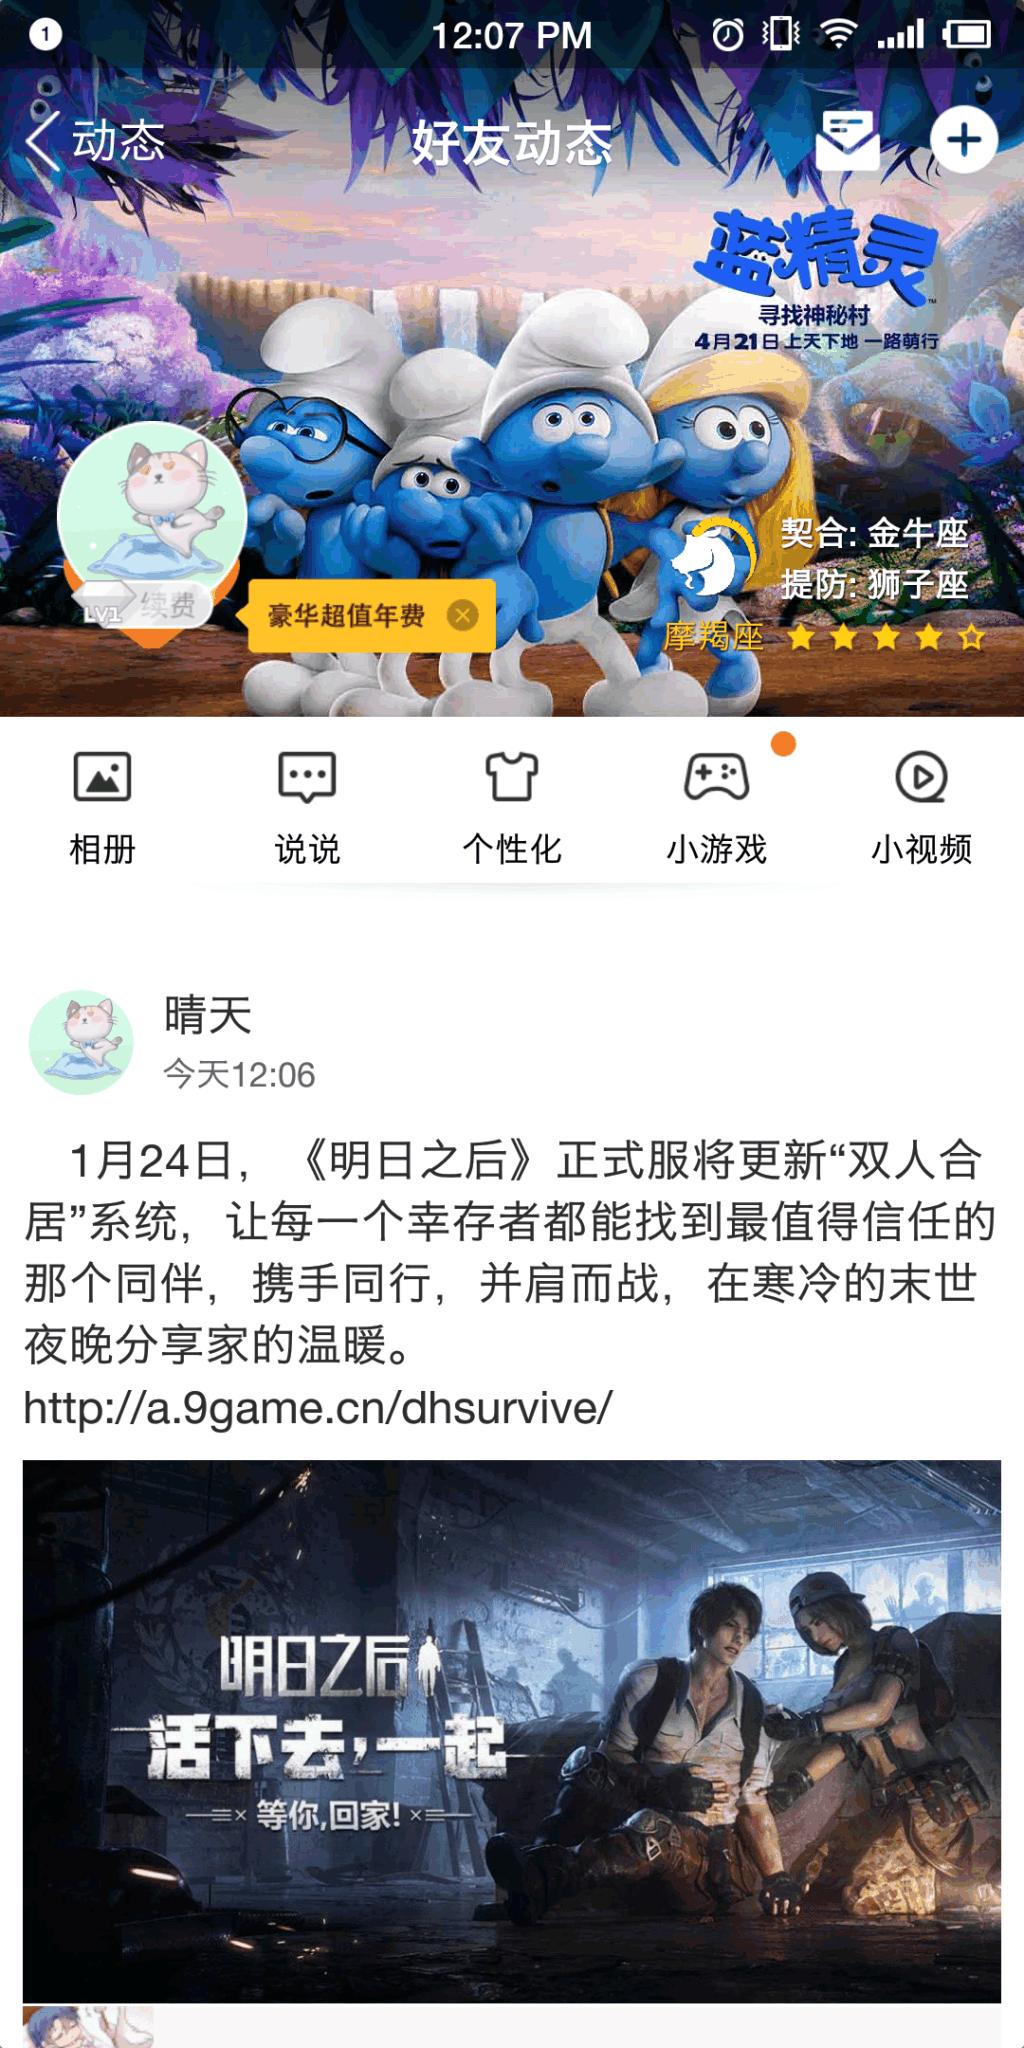 Screenshot_2019s01s18s12s07s02s876_QQ.png